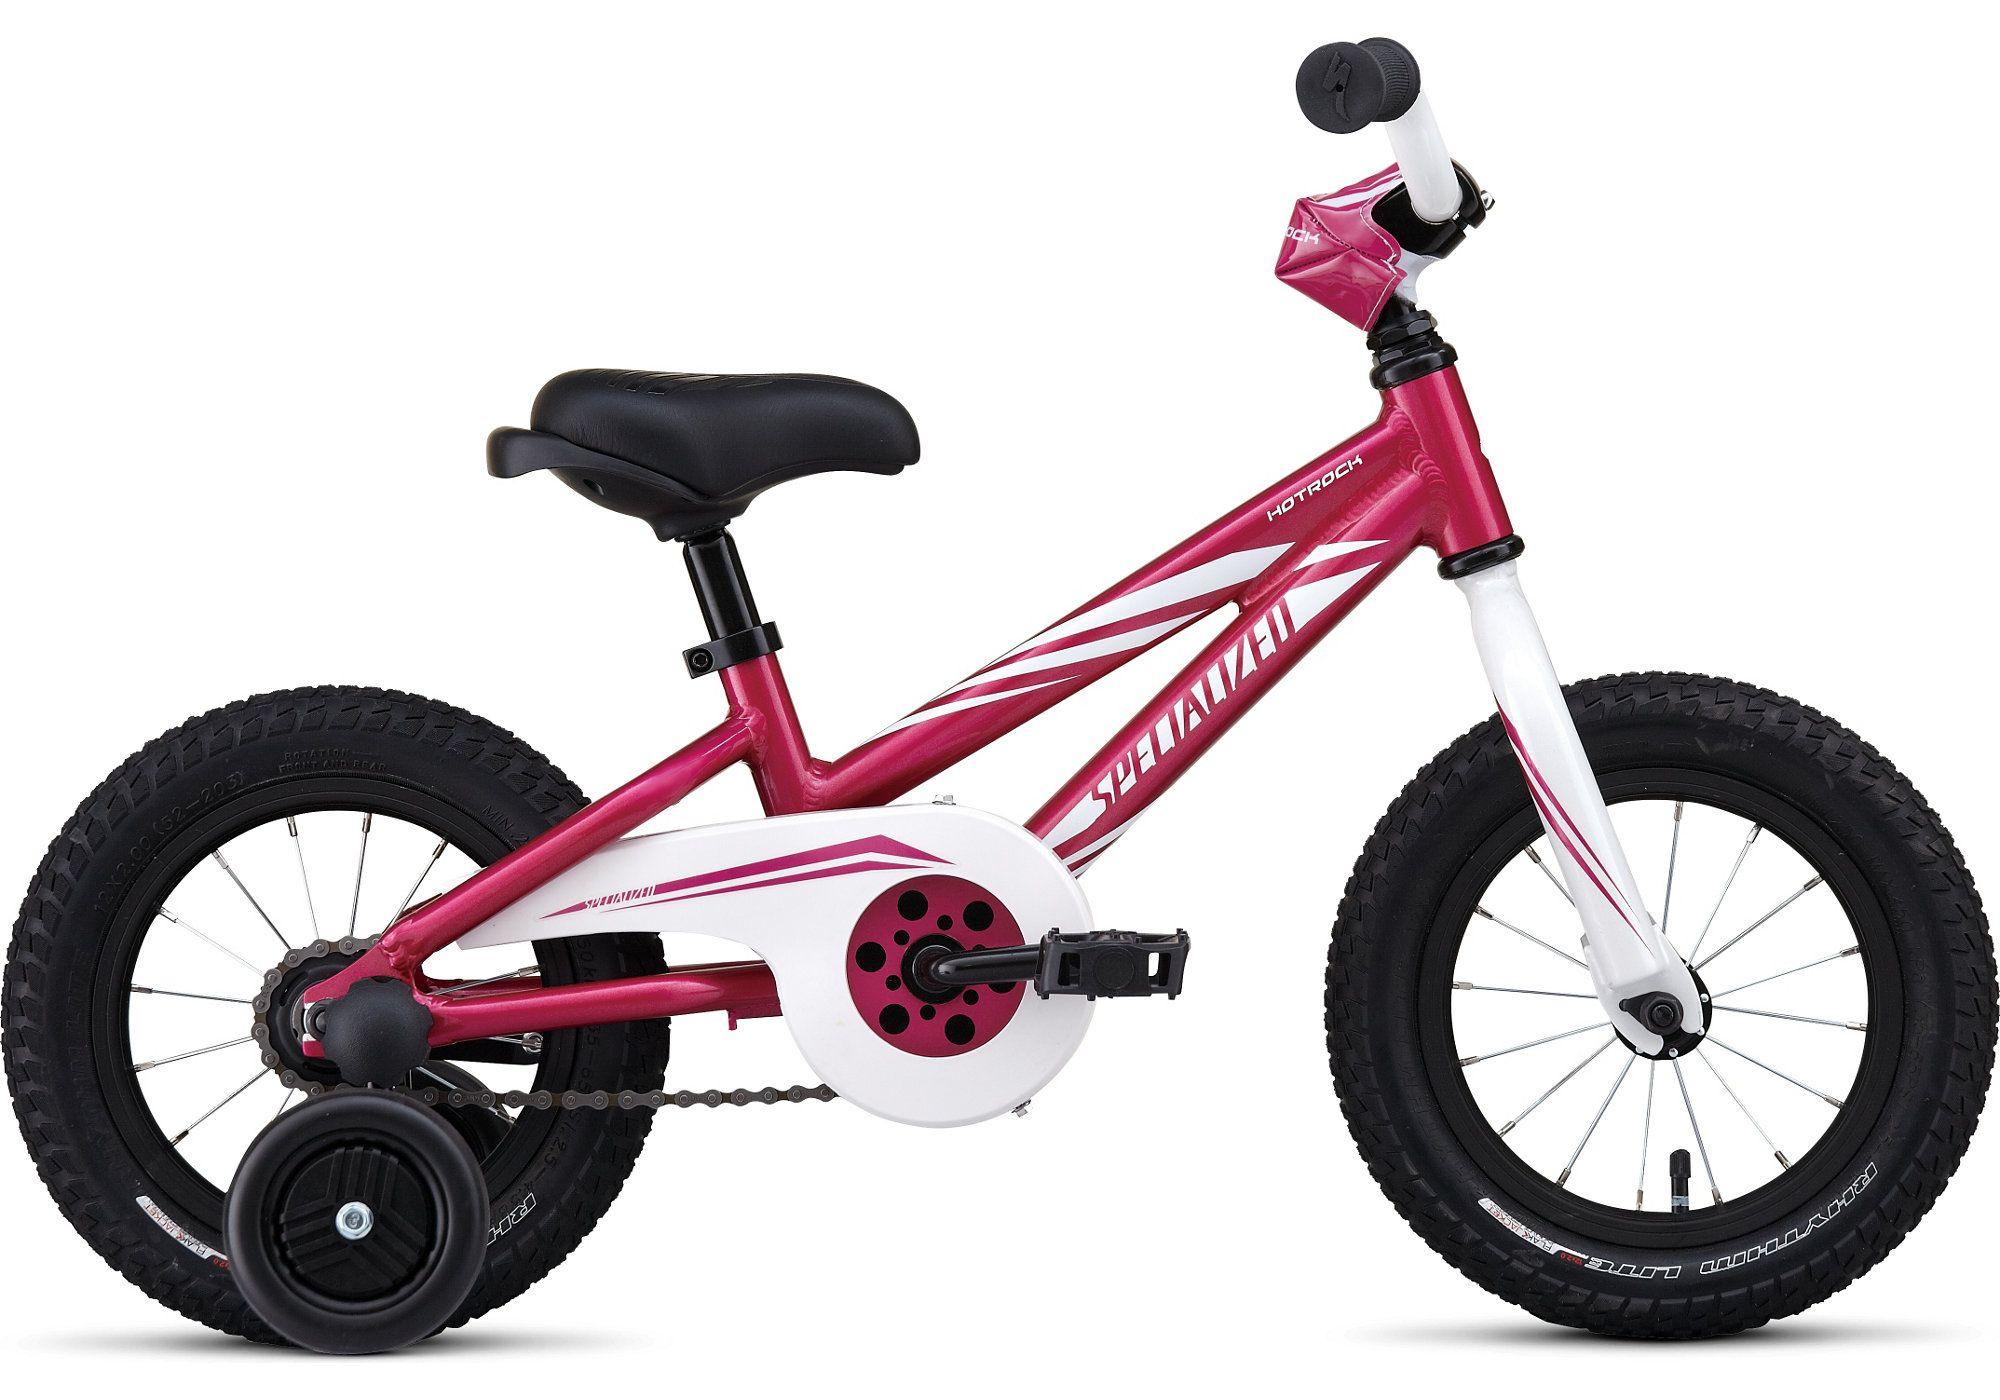 Велосипед Specialized Hotrock 12 CSTR girl Int 2016 велосипед specialized hotrock 20 6 speed boys 2016